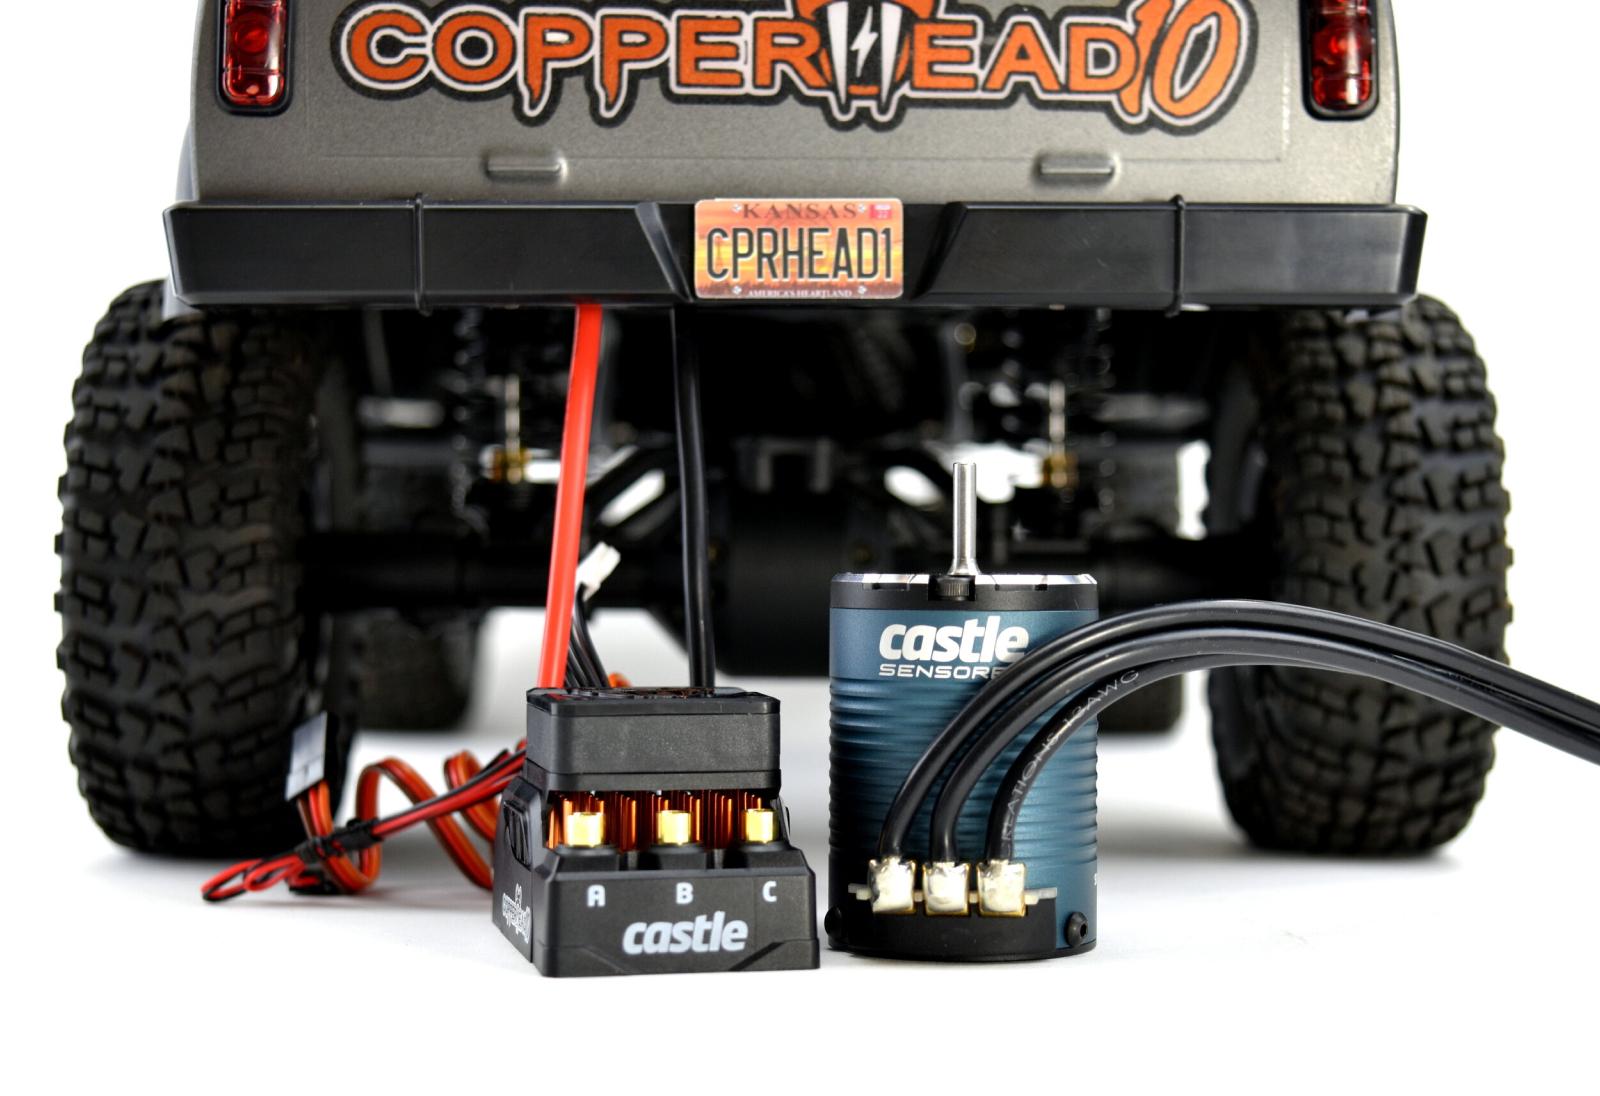 Copperhead 10 Crawler Combo